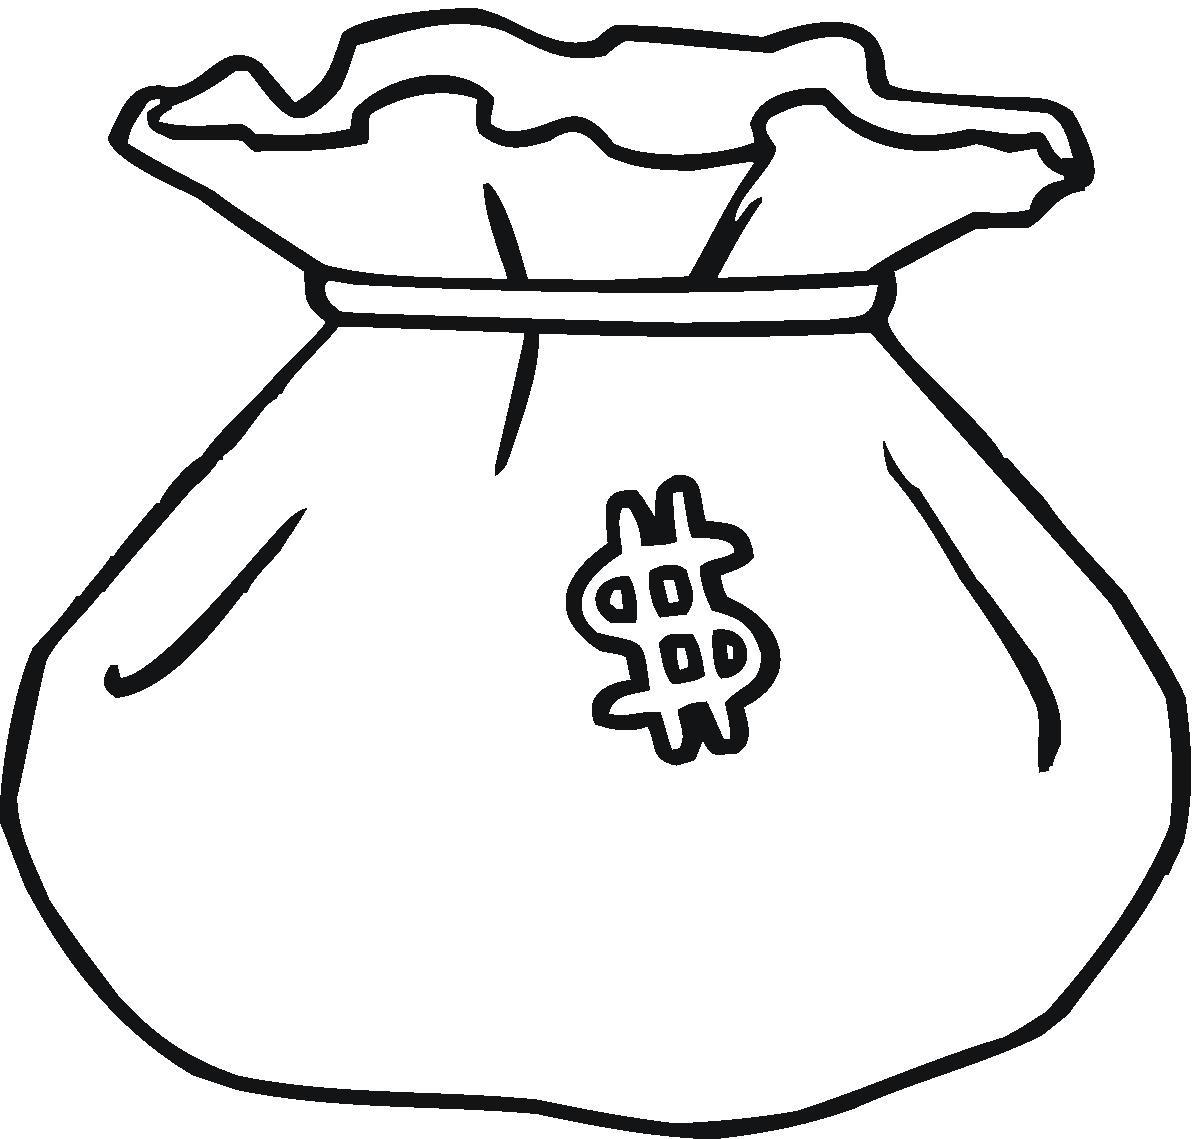 saving money clipart black and white